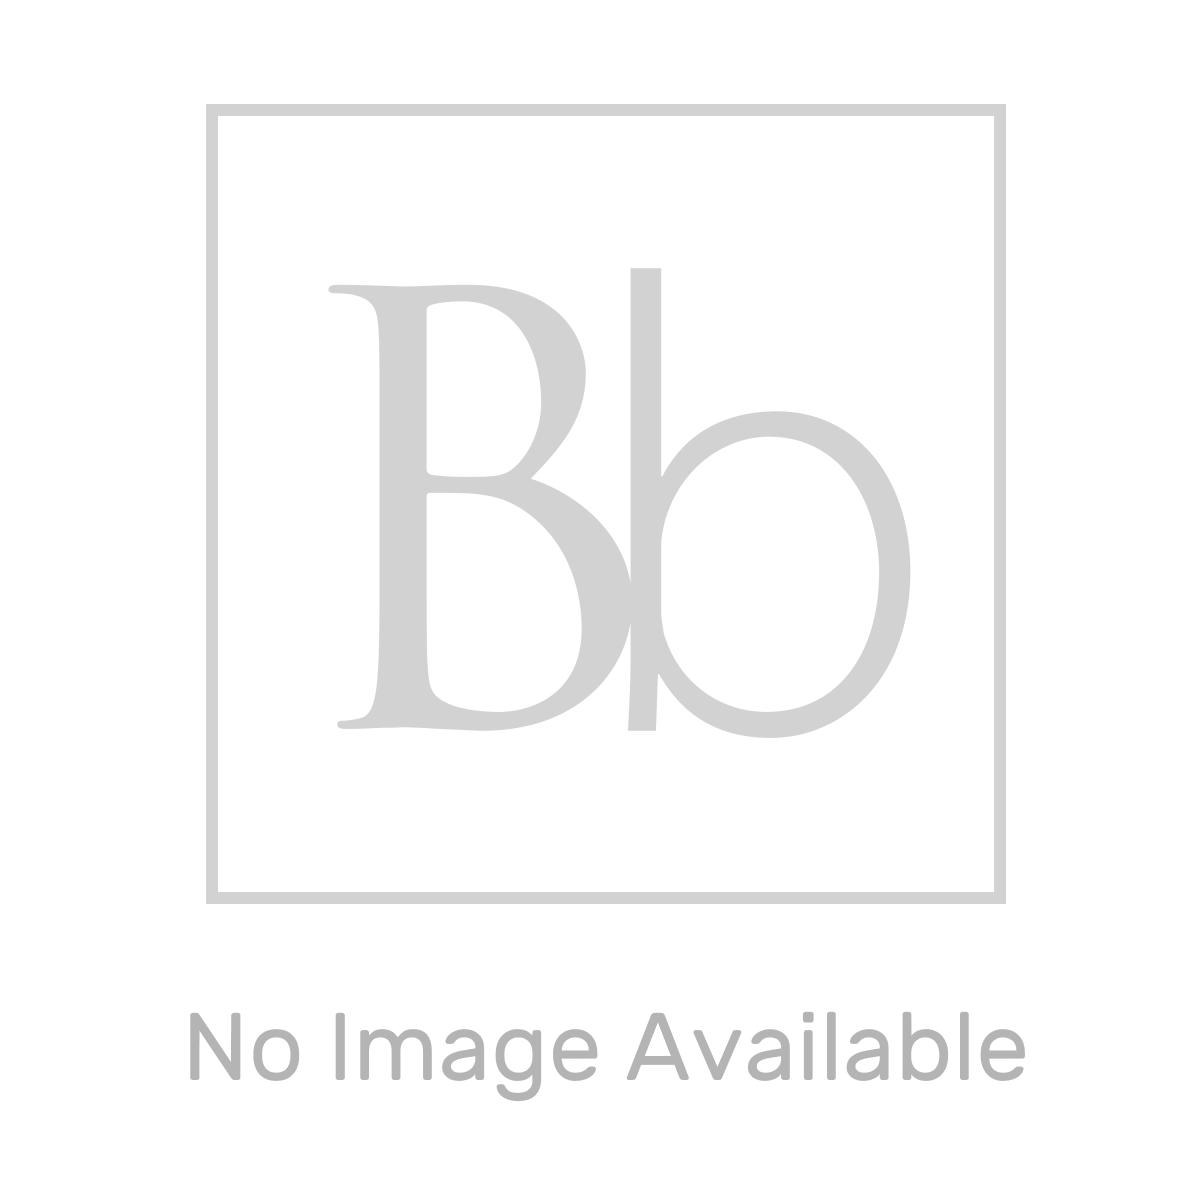 Homelux Aluminium Straight Edge 10mm Stainless Steel Tile Trim 2.5m